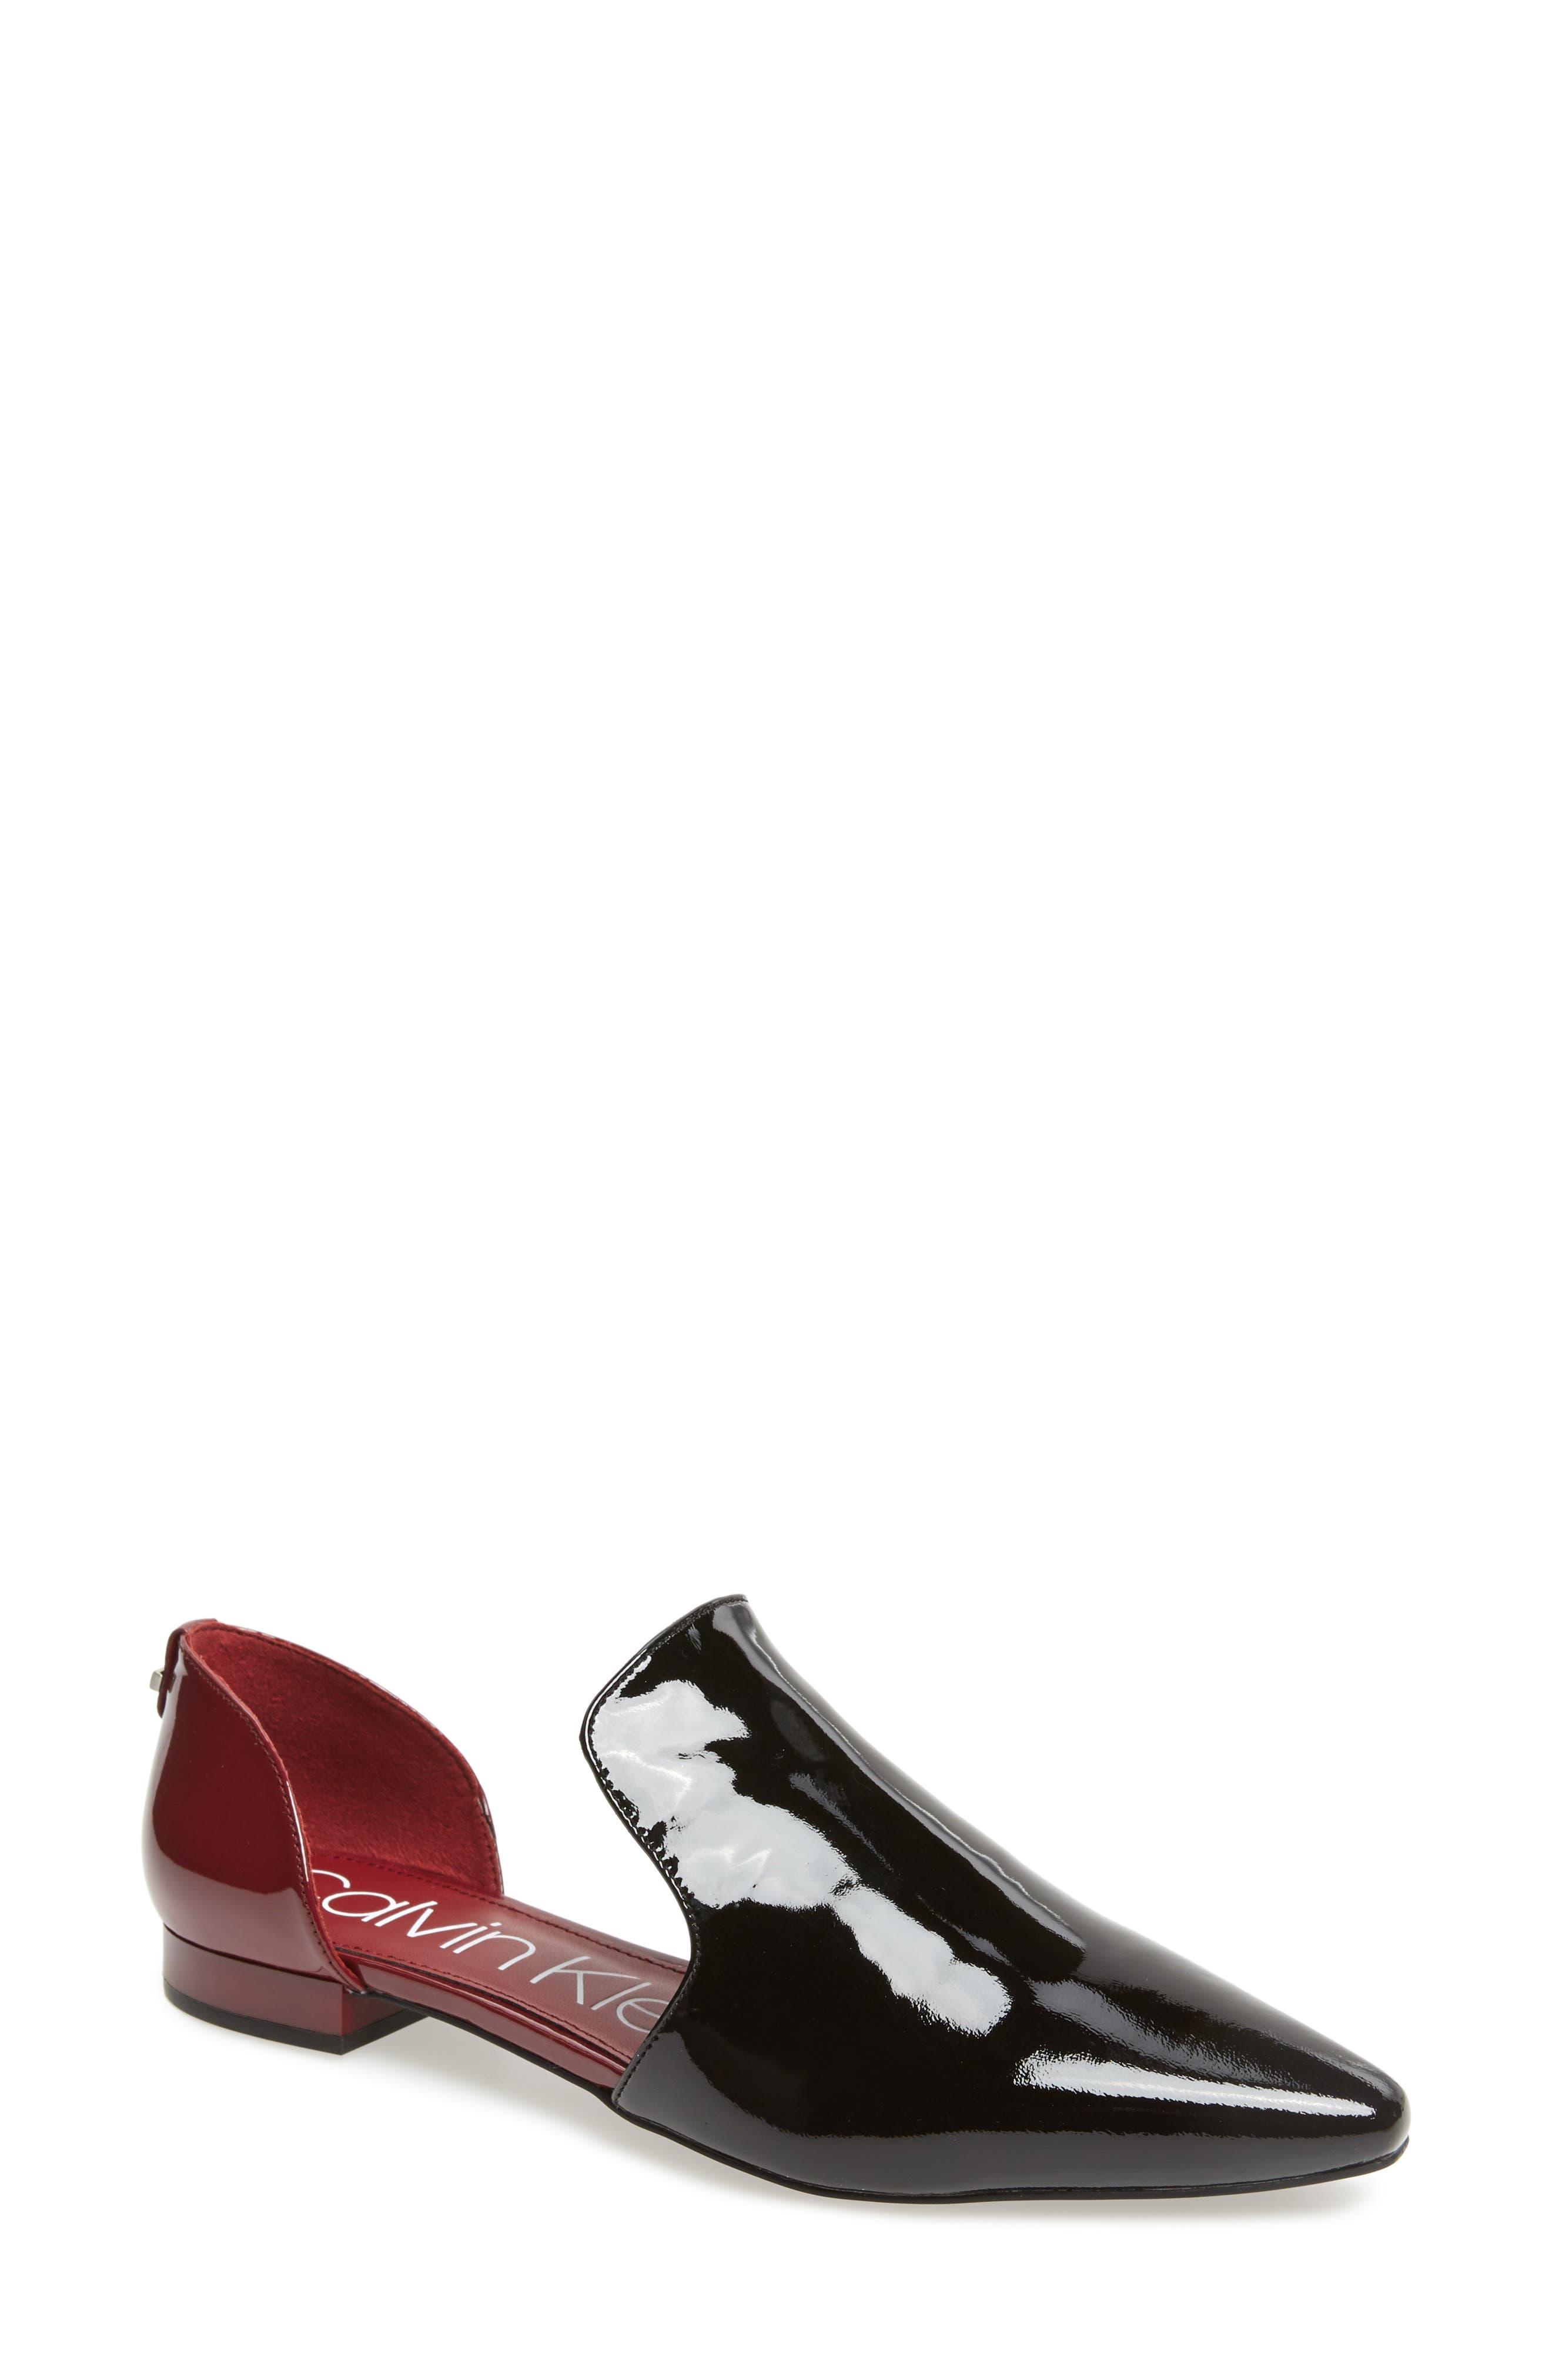 CALVIN KLEIN Edona Loafer Flat, Main, color, 016